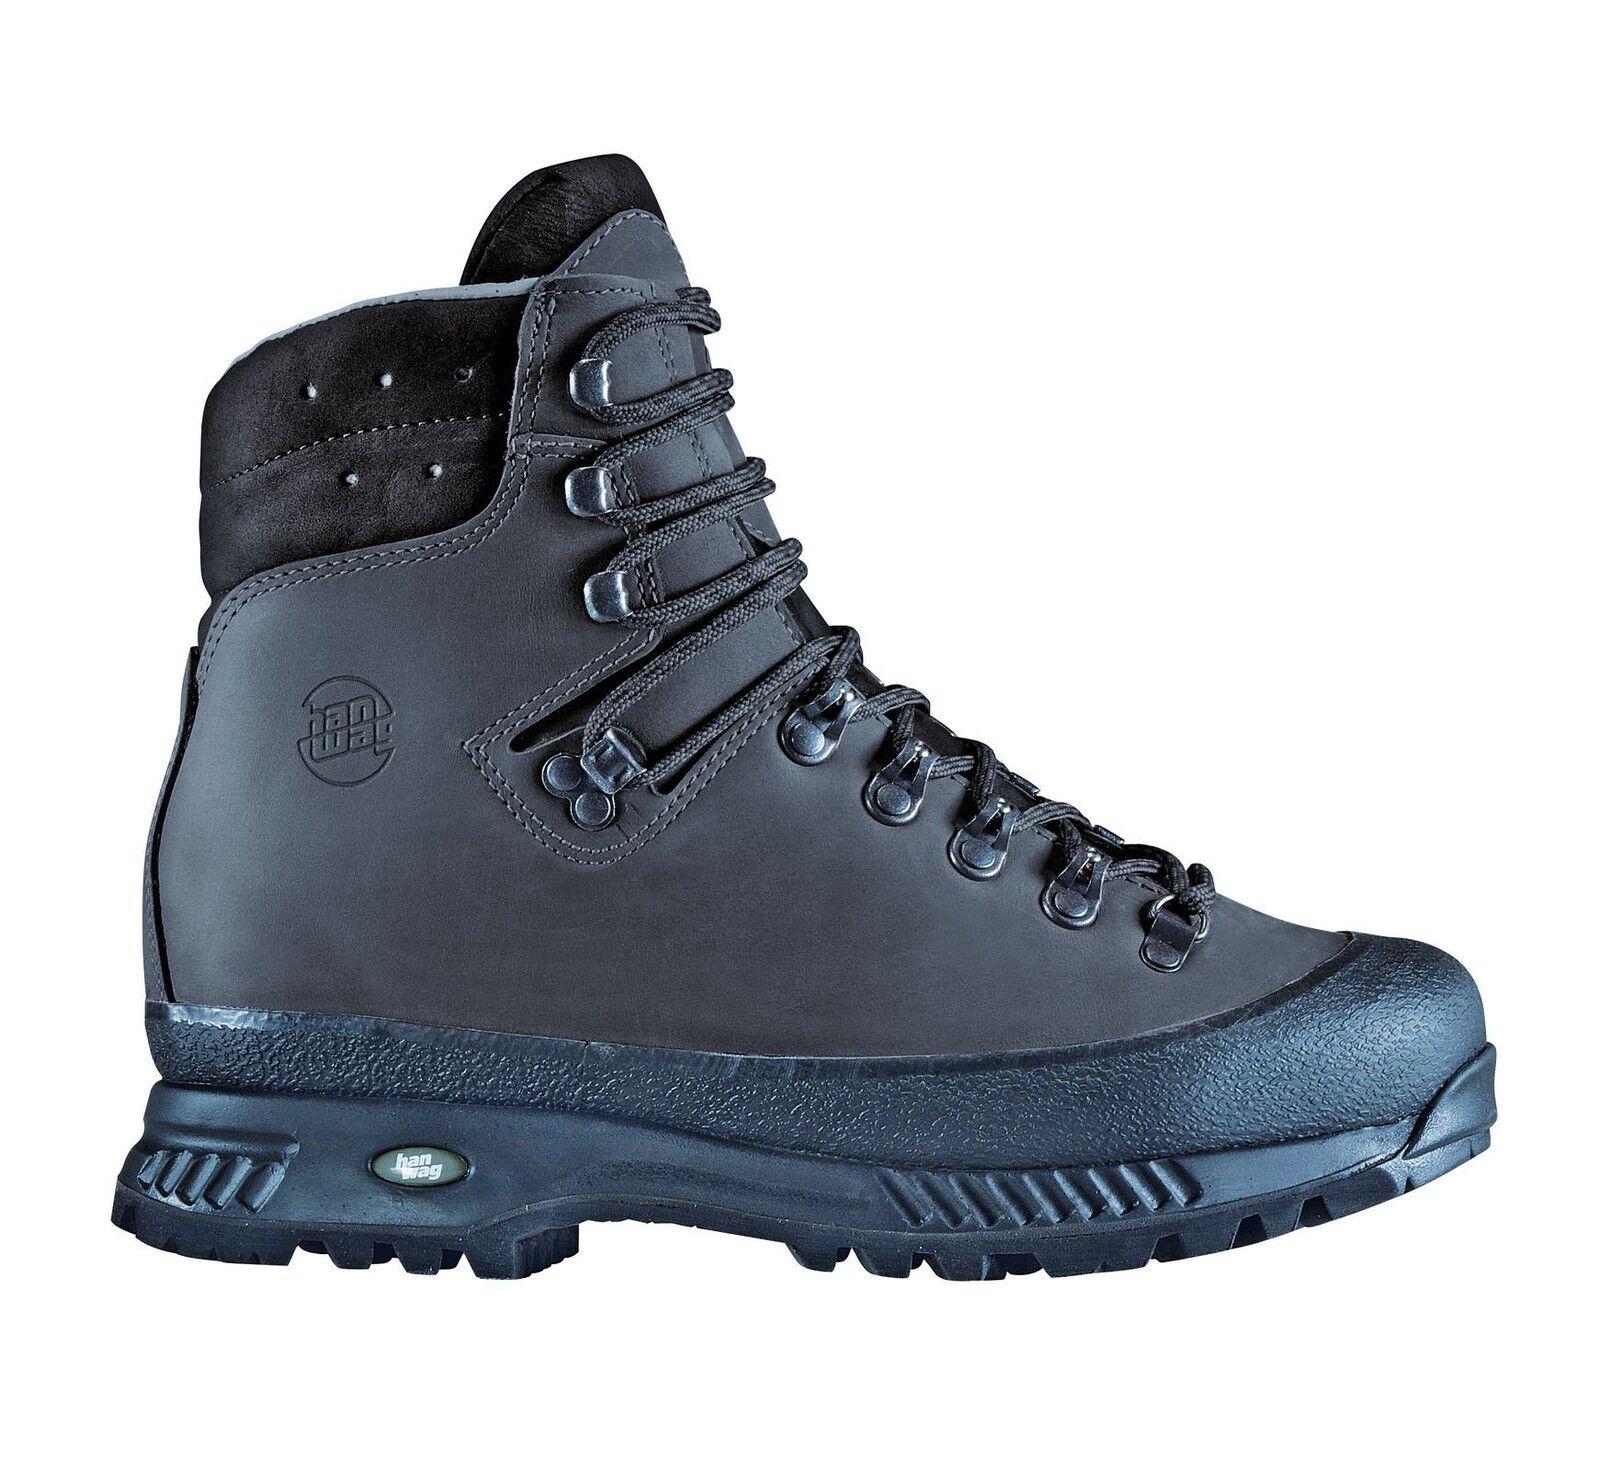 Hanwag Zapatos de Montaña  Yukon Men Piel Tamaño 8,5-42,5 Ceniza